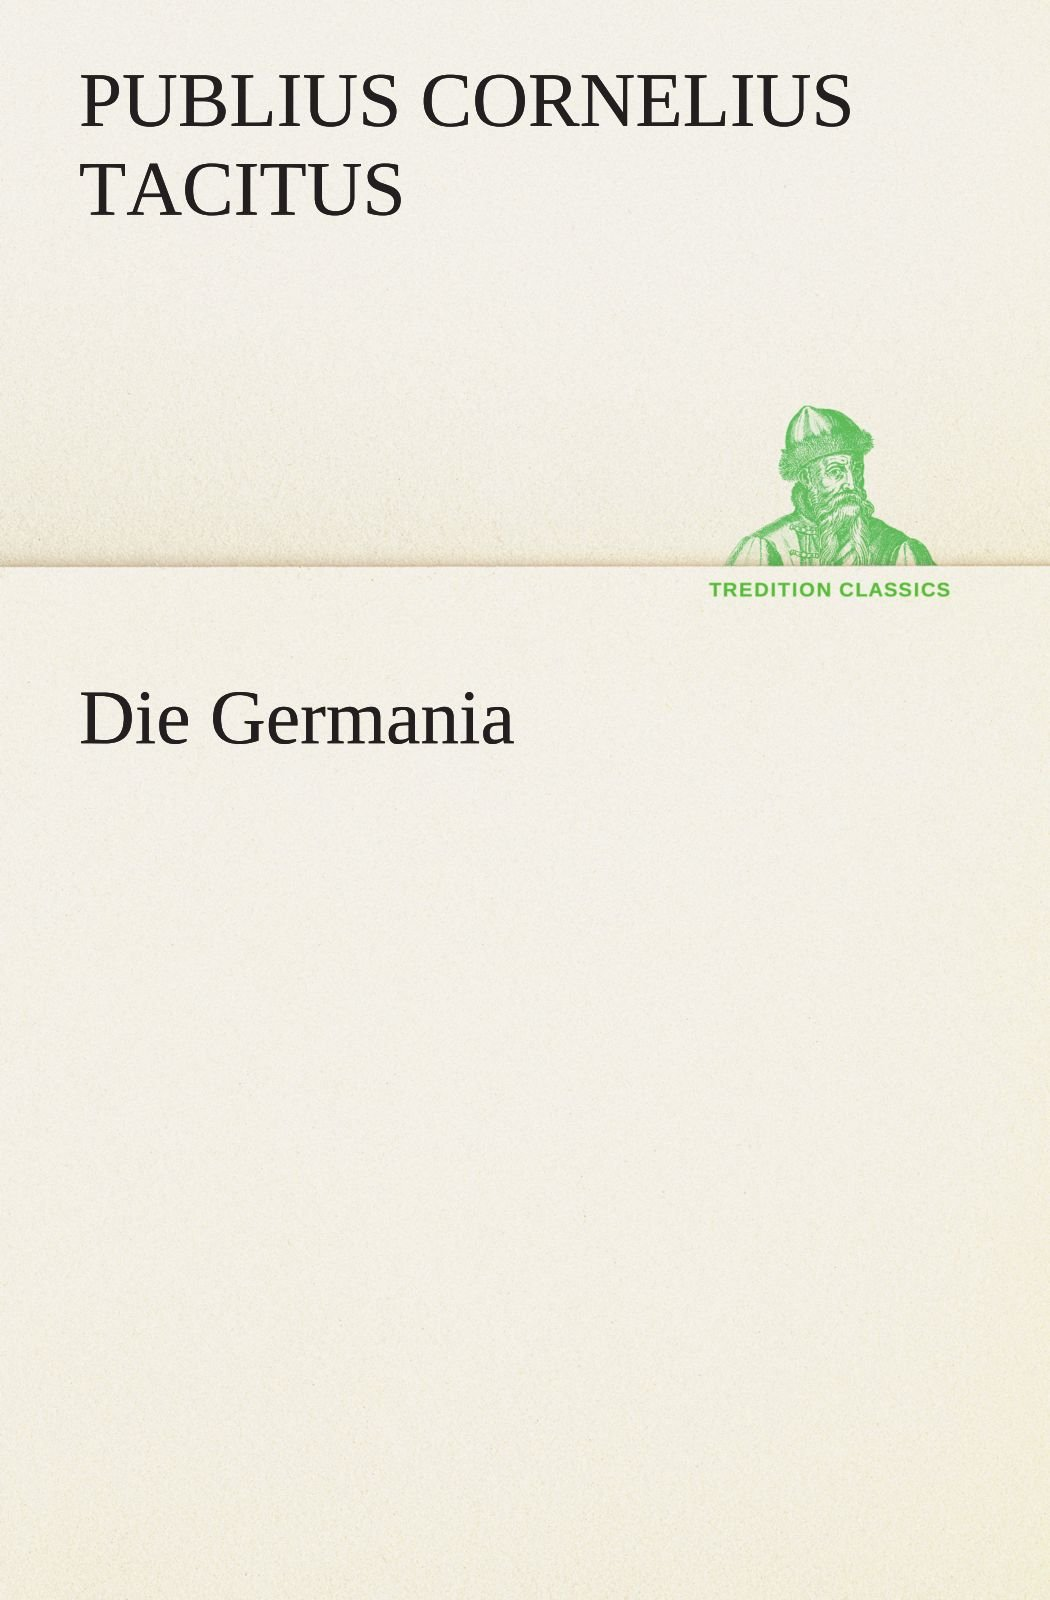 Download Die Germania (TREDITION CLASSICS) (German Edition) ebook